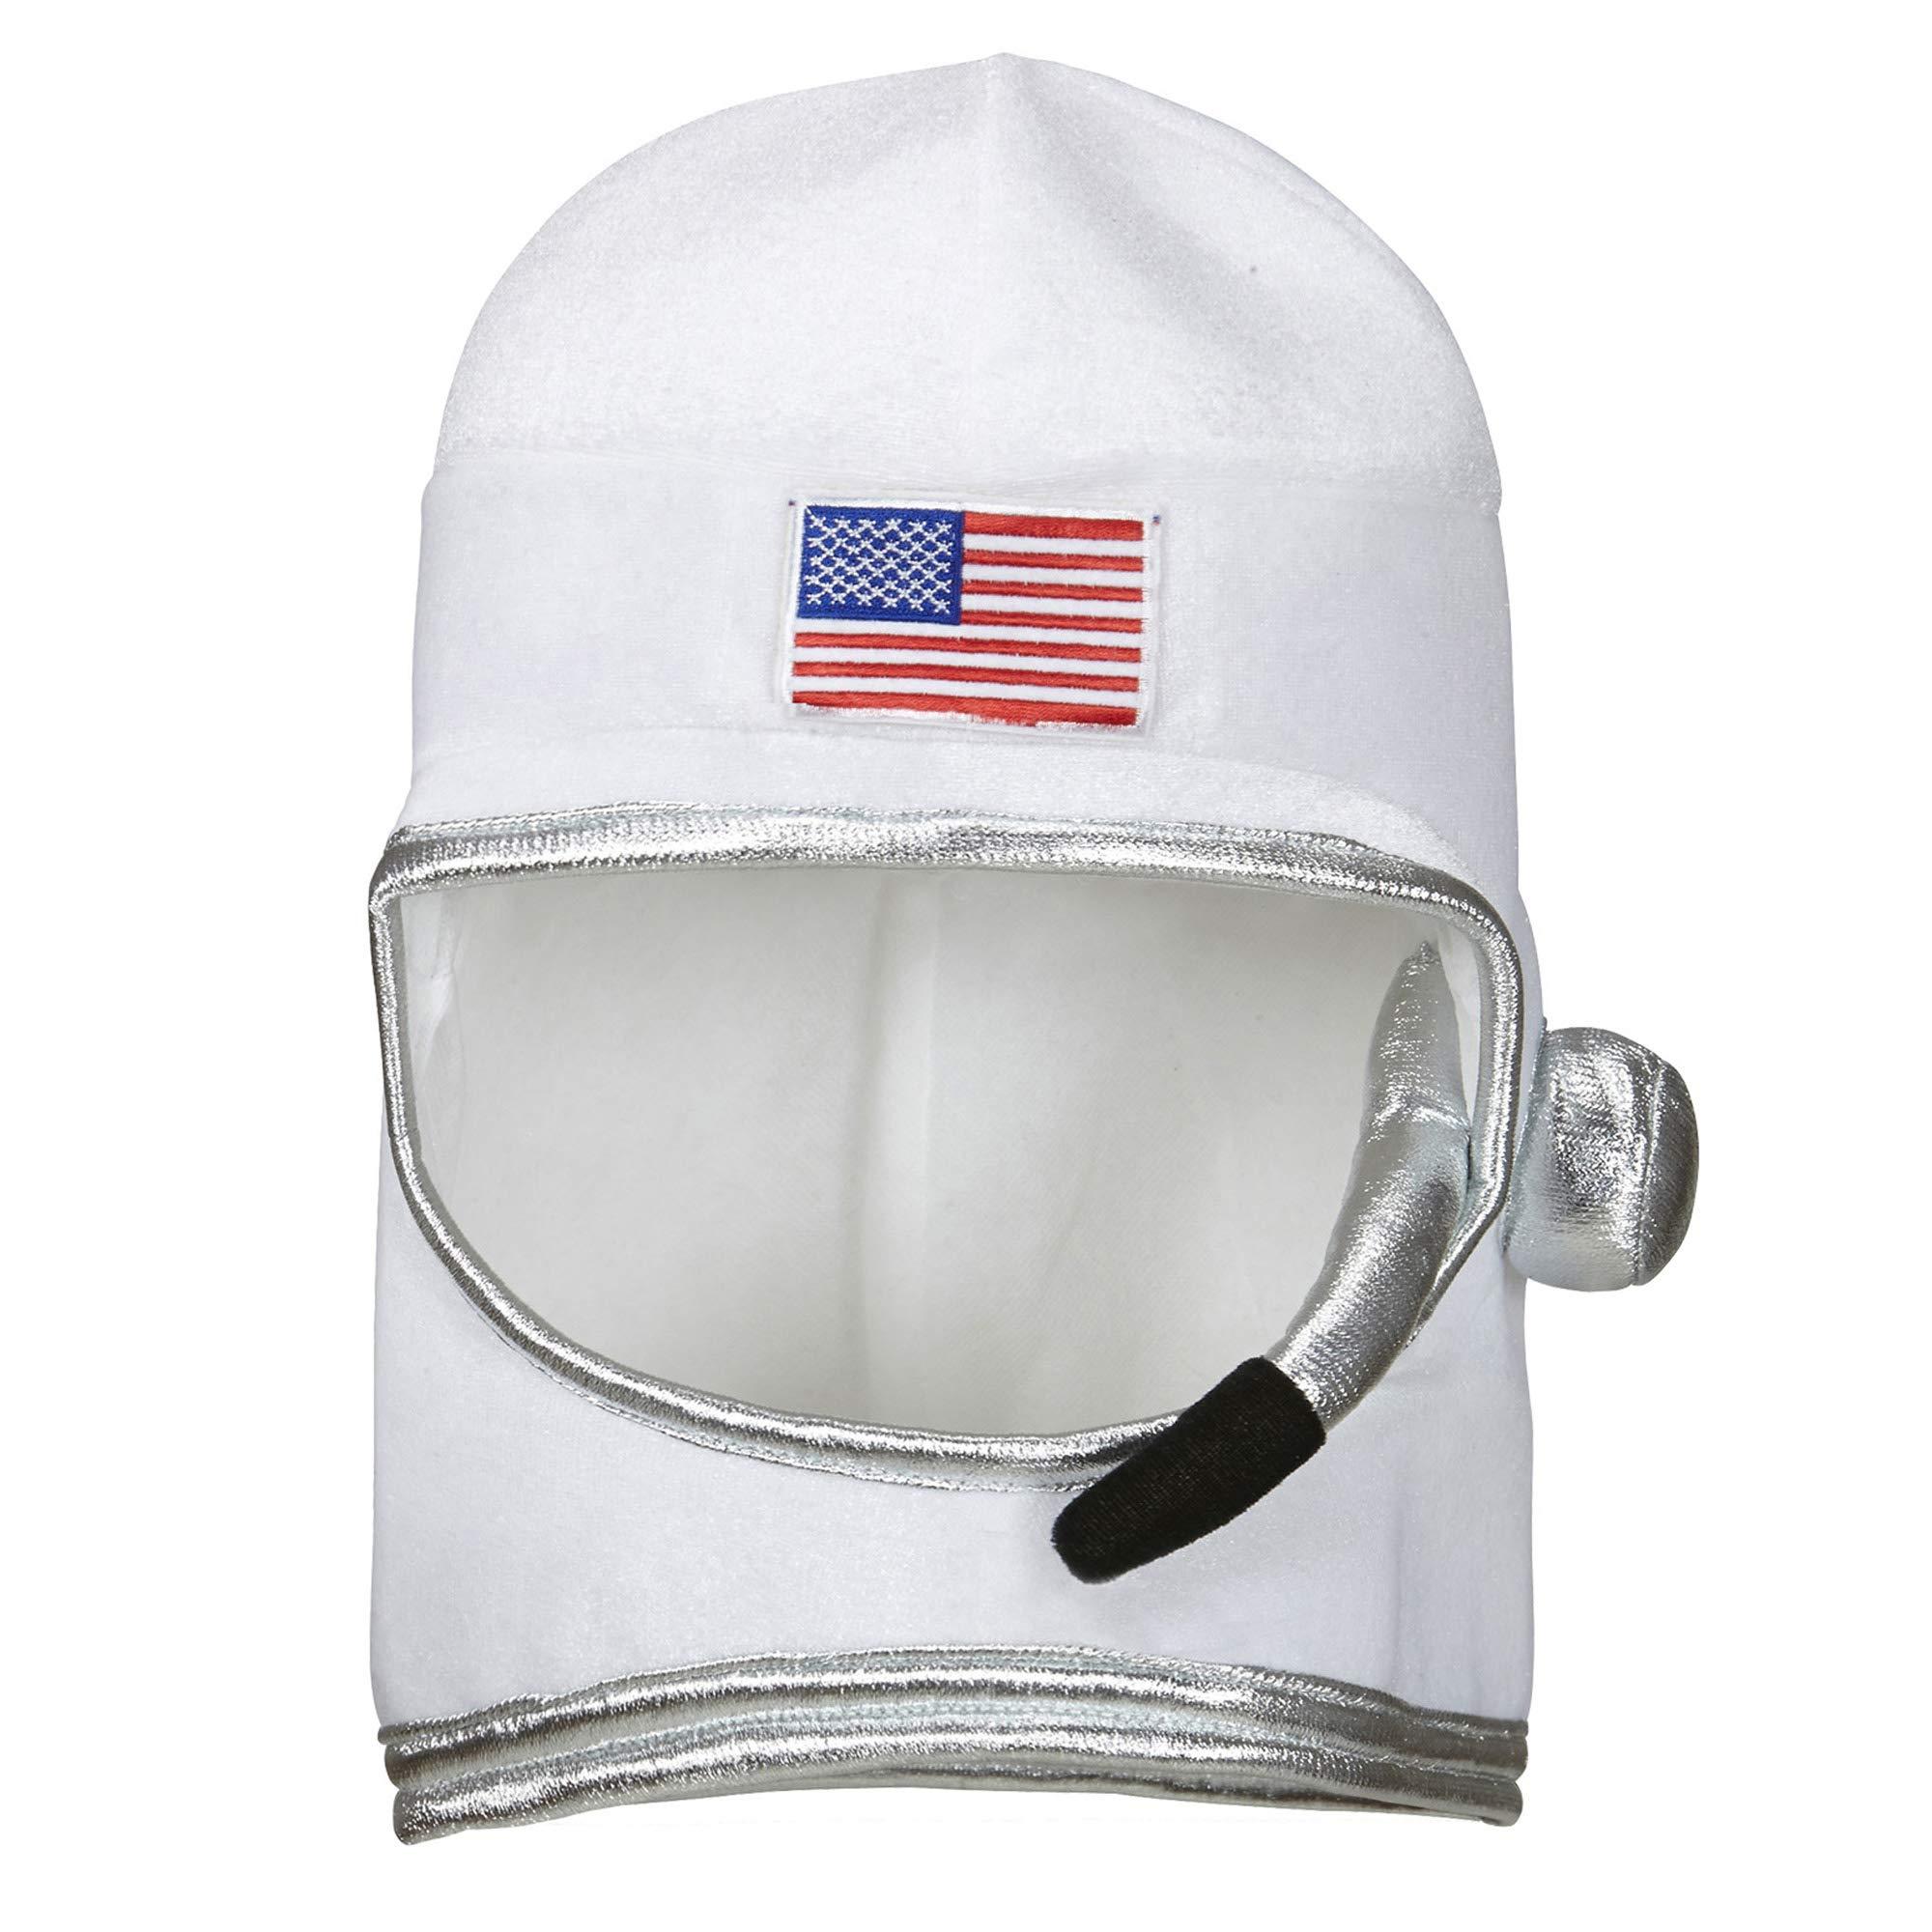 widmann 01116-Astronaut Helmet for Adults-One Size